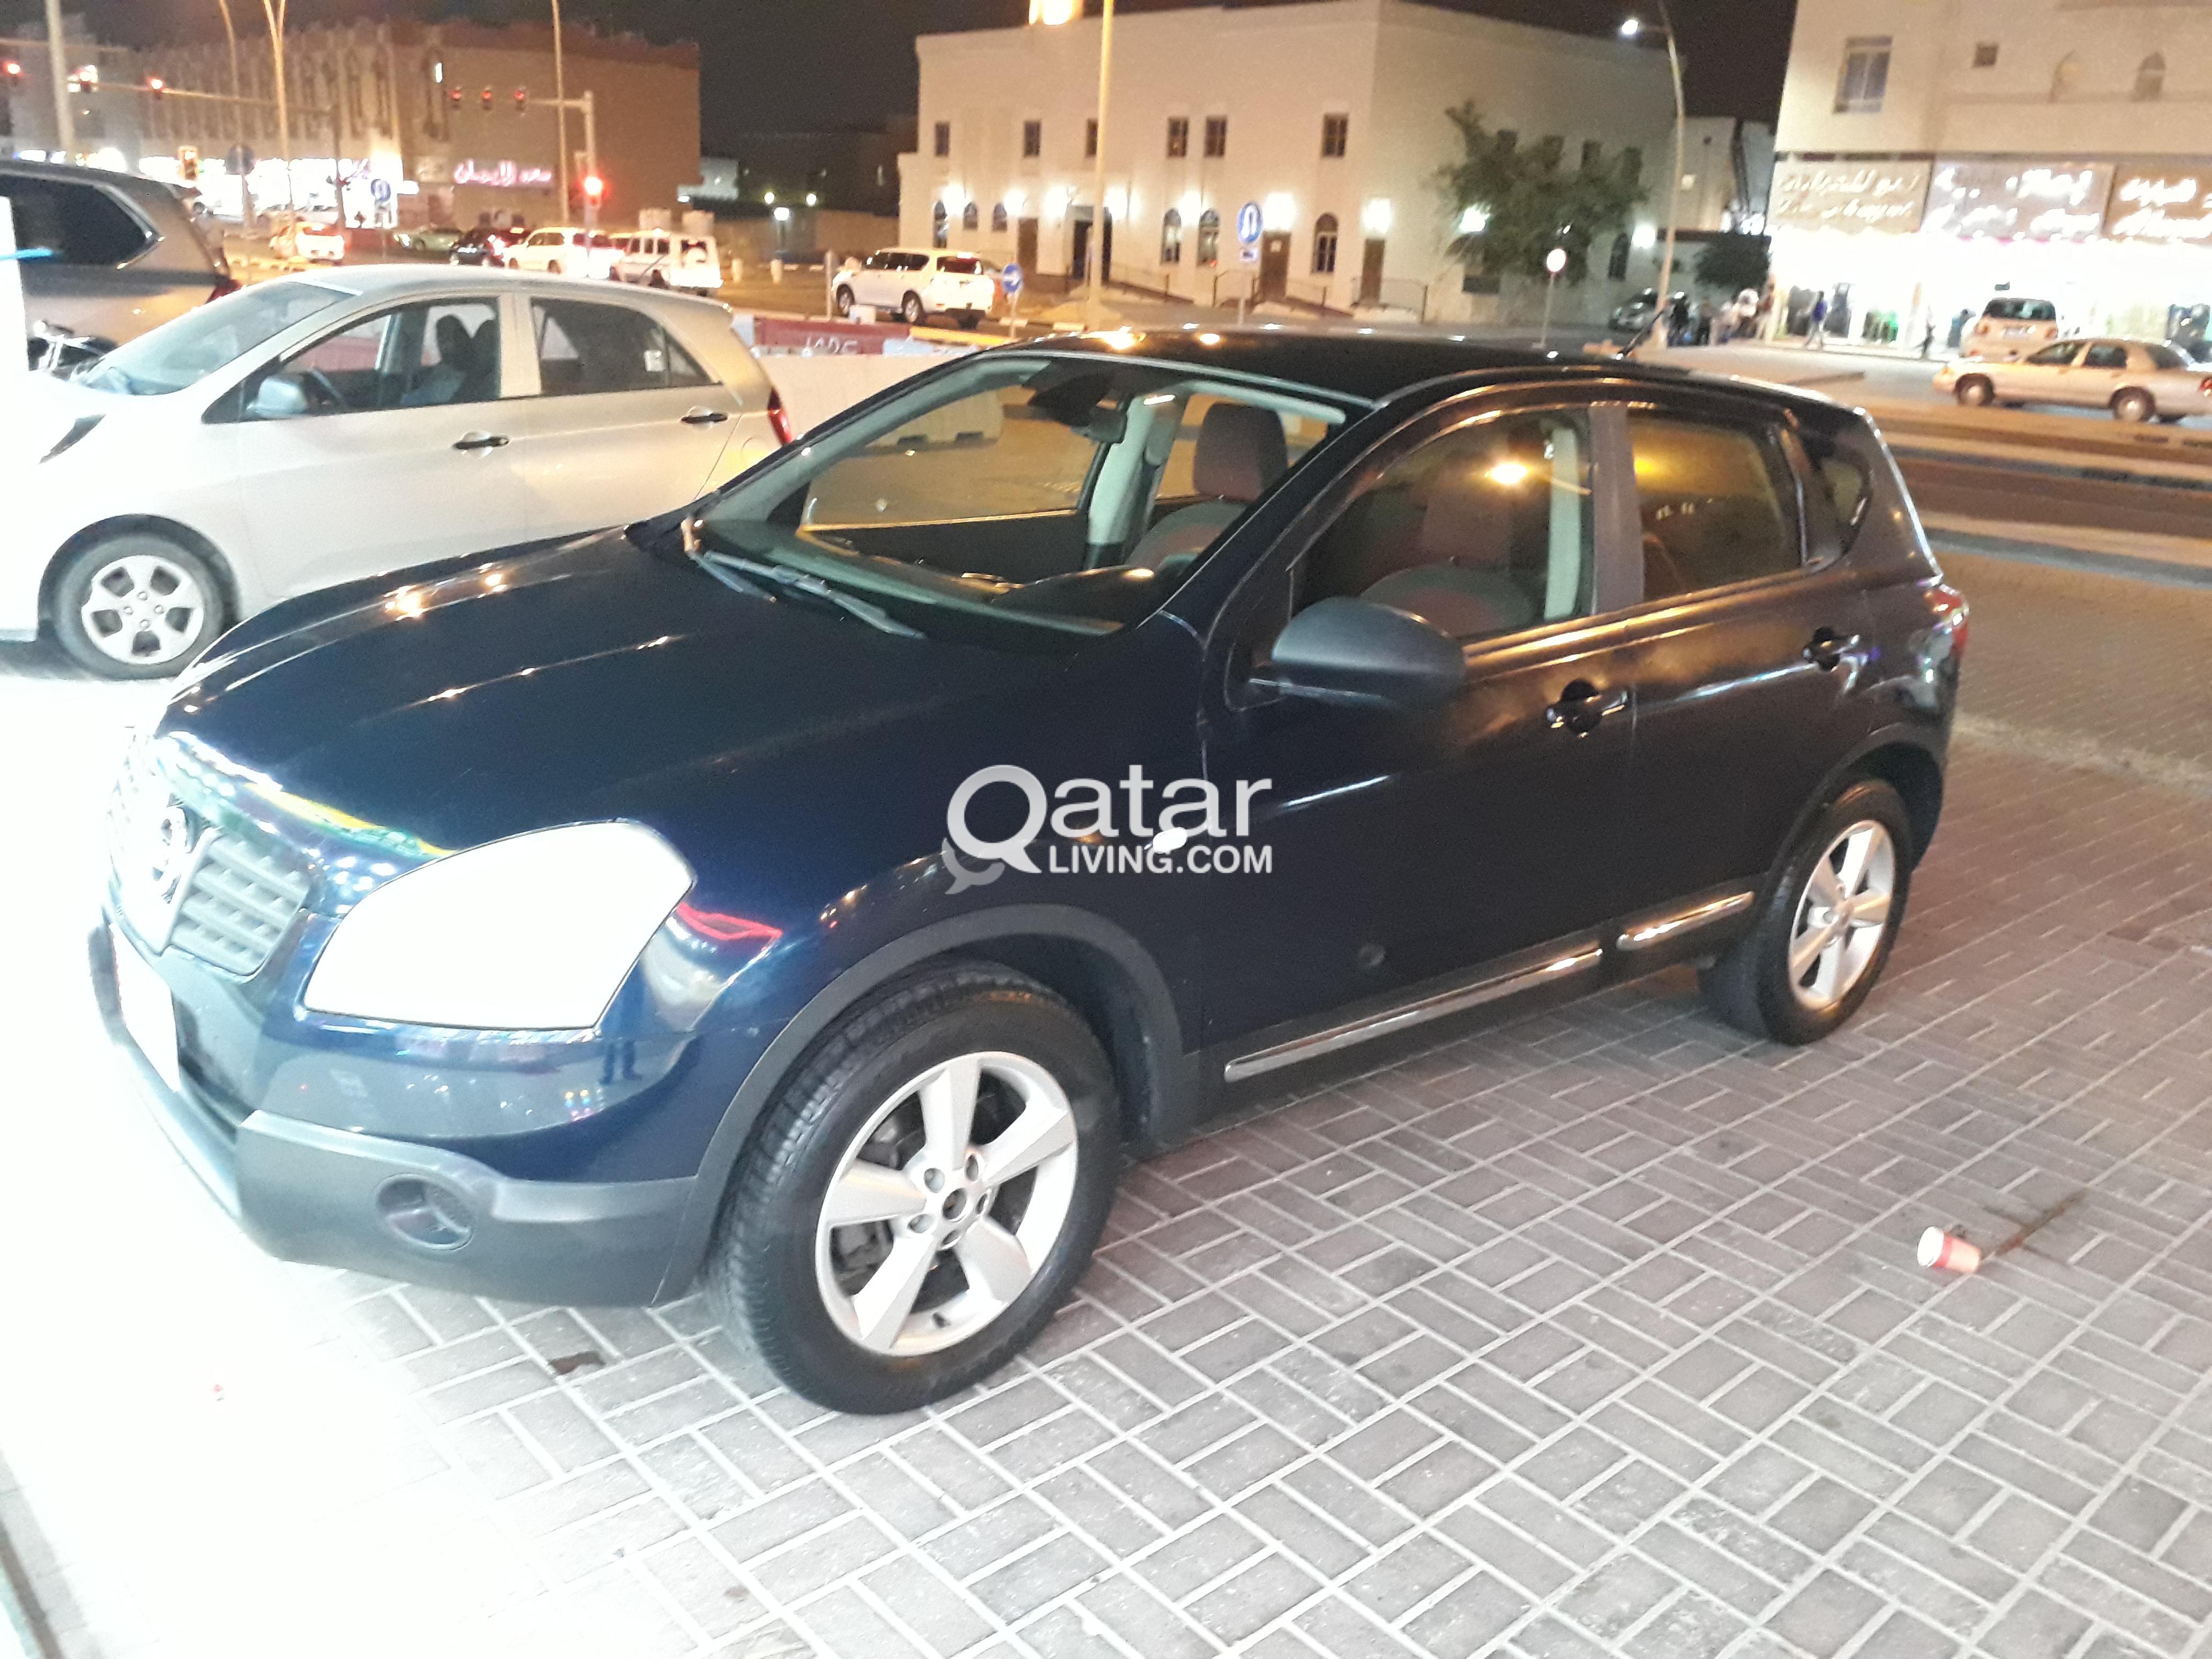 Nissan Used Car Showroom Qatar Preowned Nissan Vehicles Qatar Saleh